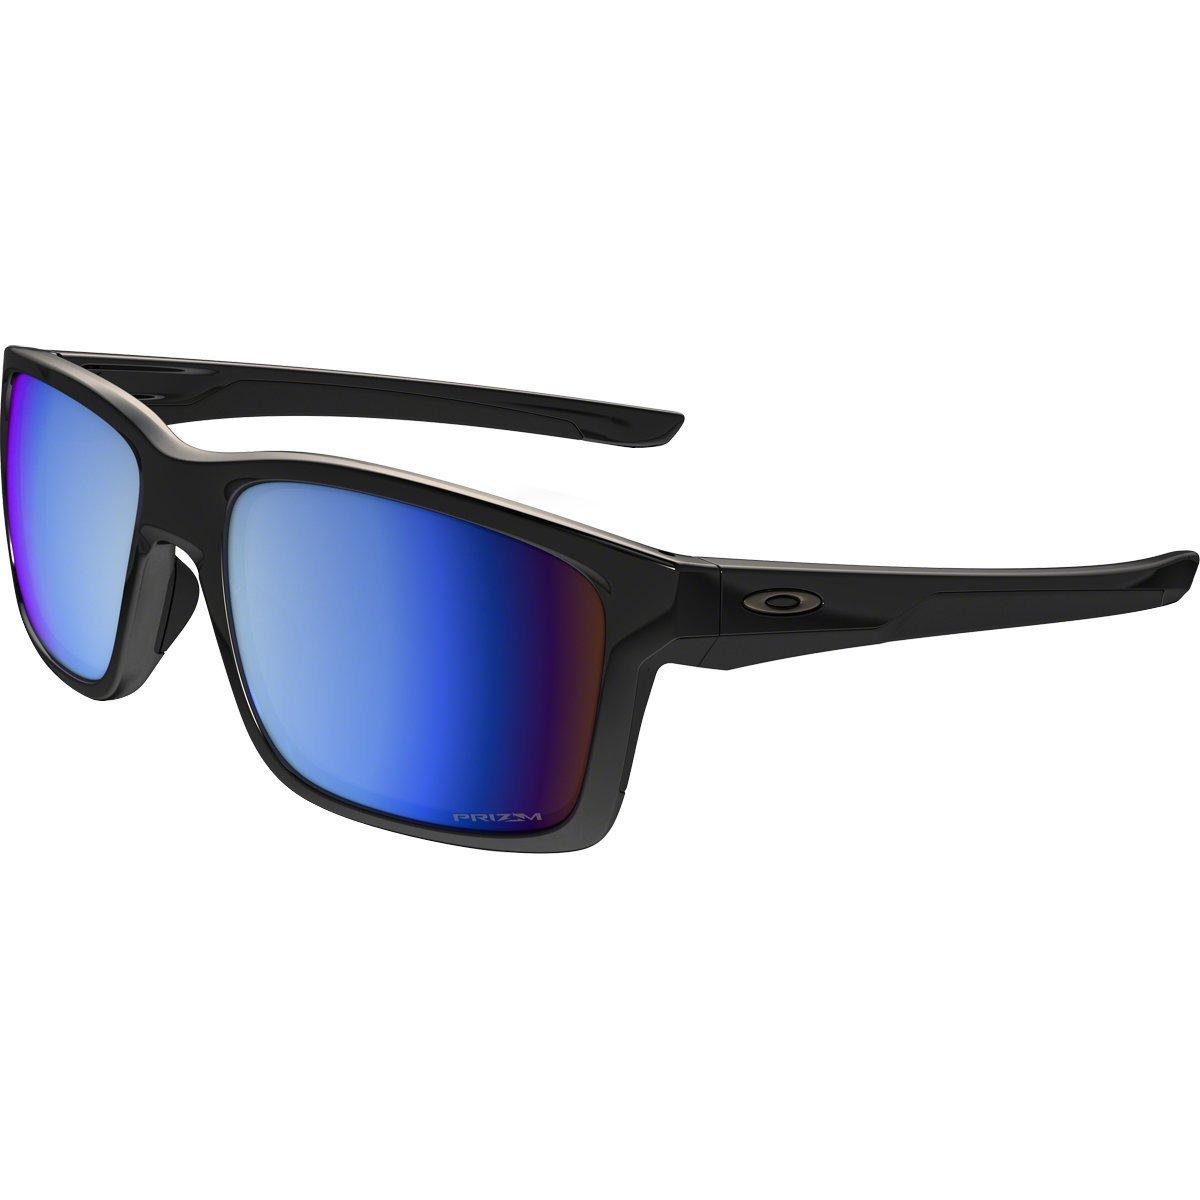 Oakley Mainlink, Gafas de sol, Rectangulares, Polarizadas, 57, Negro y azul